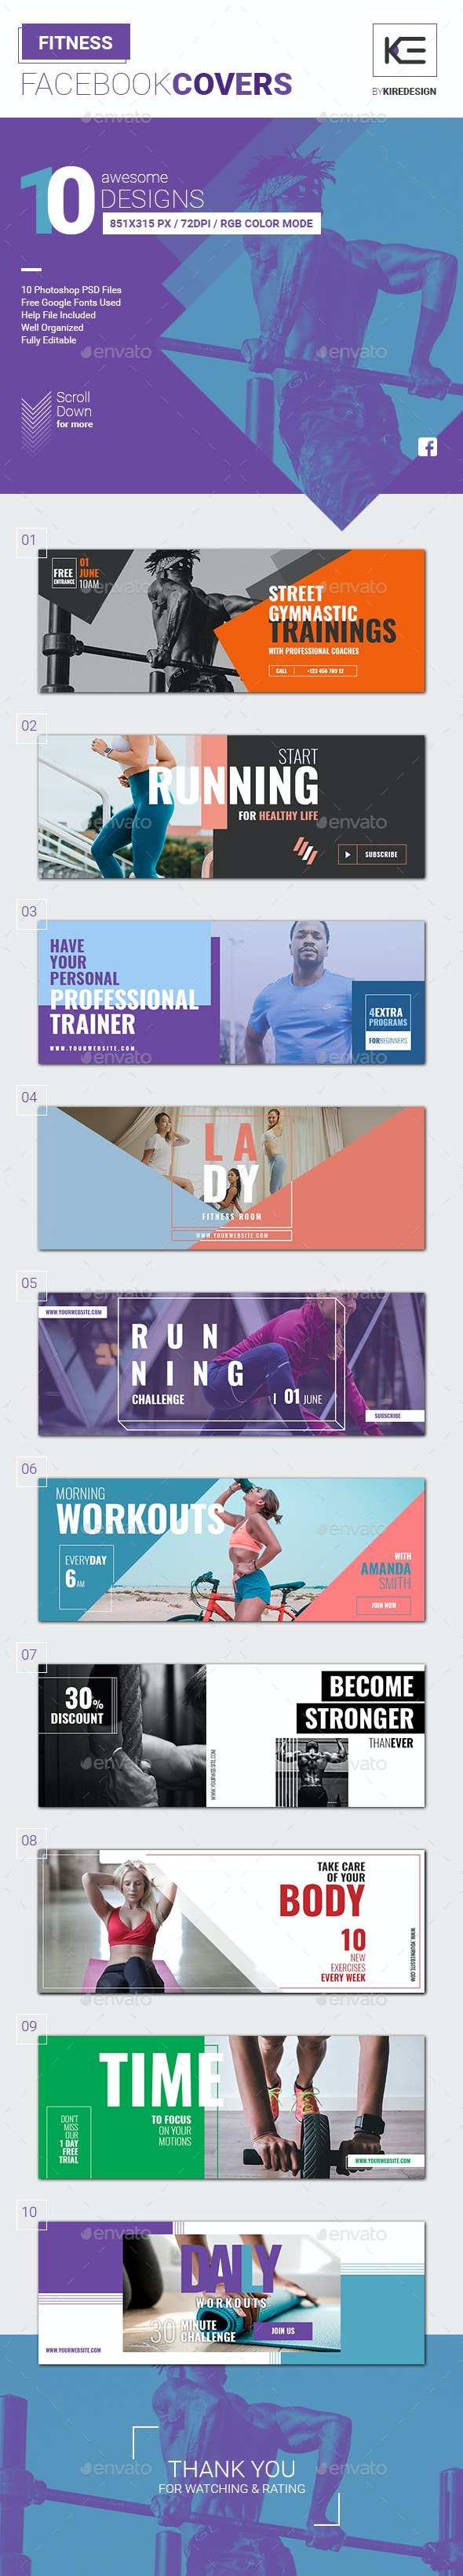 10 Fitness Facebook Covers - Social Media Web Elements